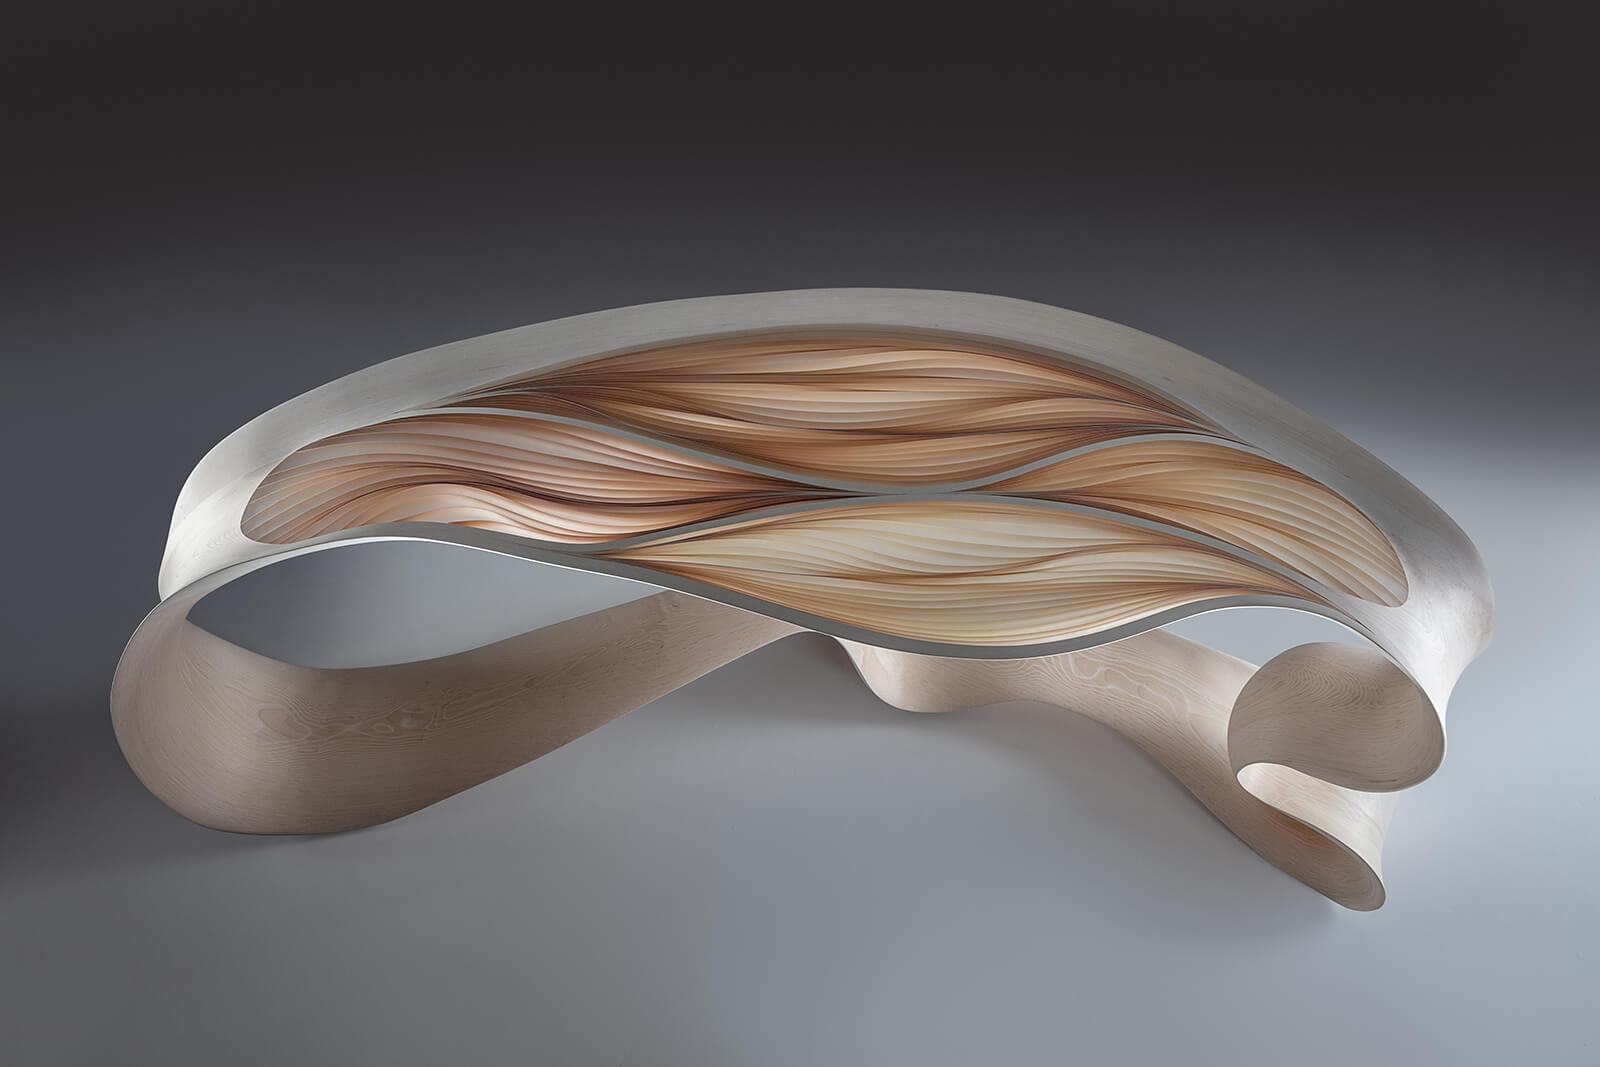 Marc Fish, 'Ethereal Desk', 2018 COURTESY: Marc Fish / PHOTOGRAPHER: Simon Eldon